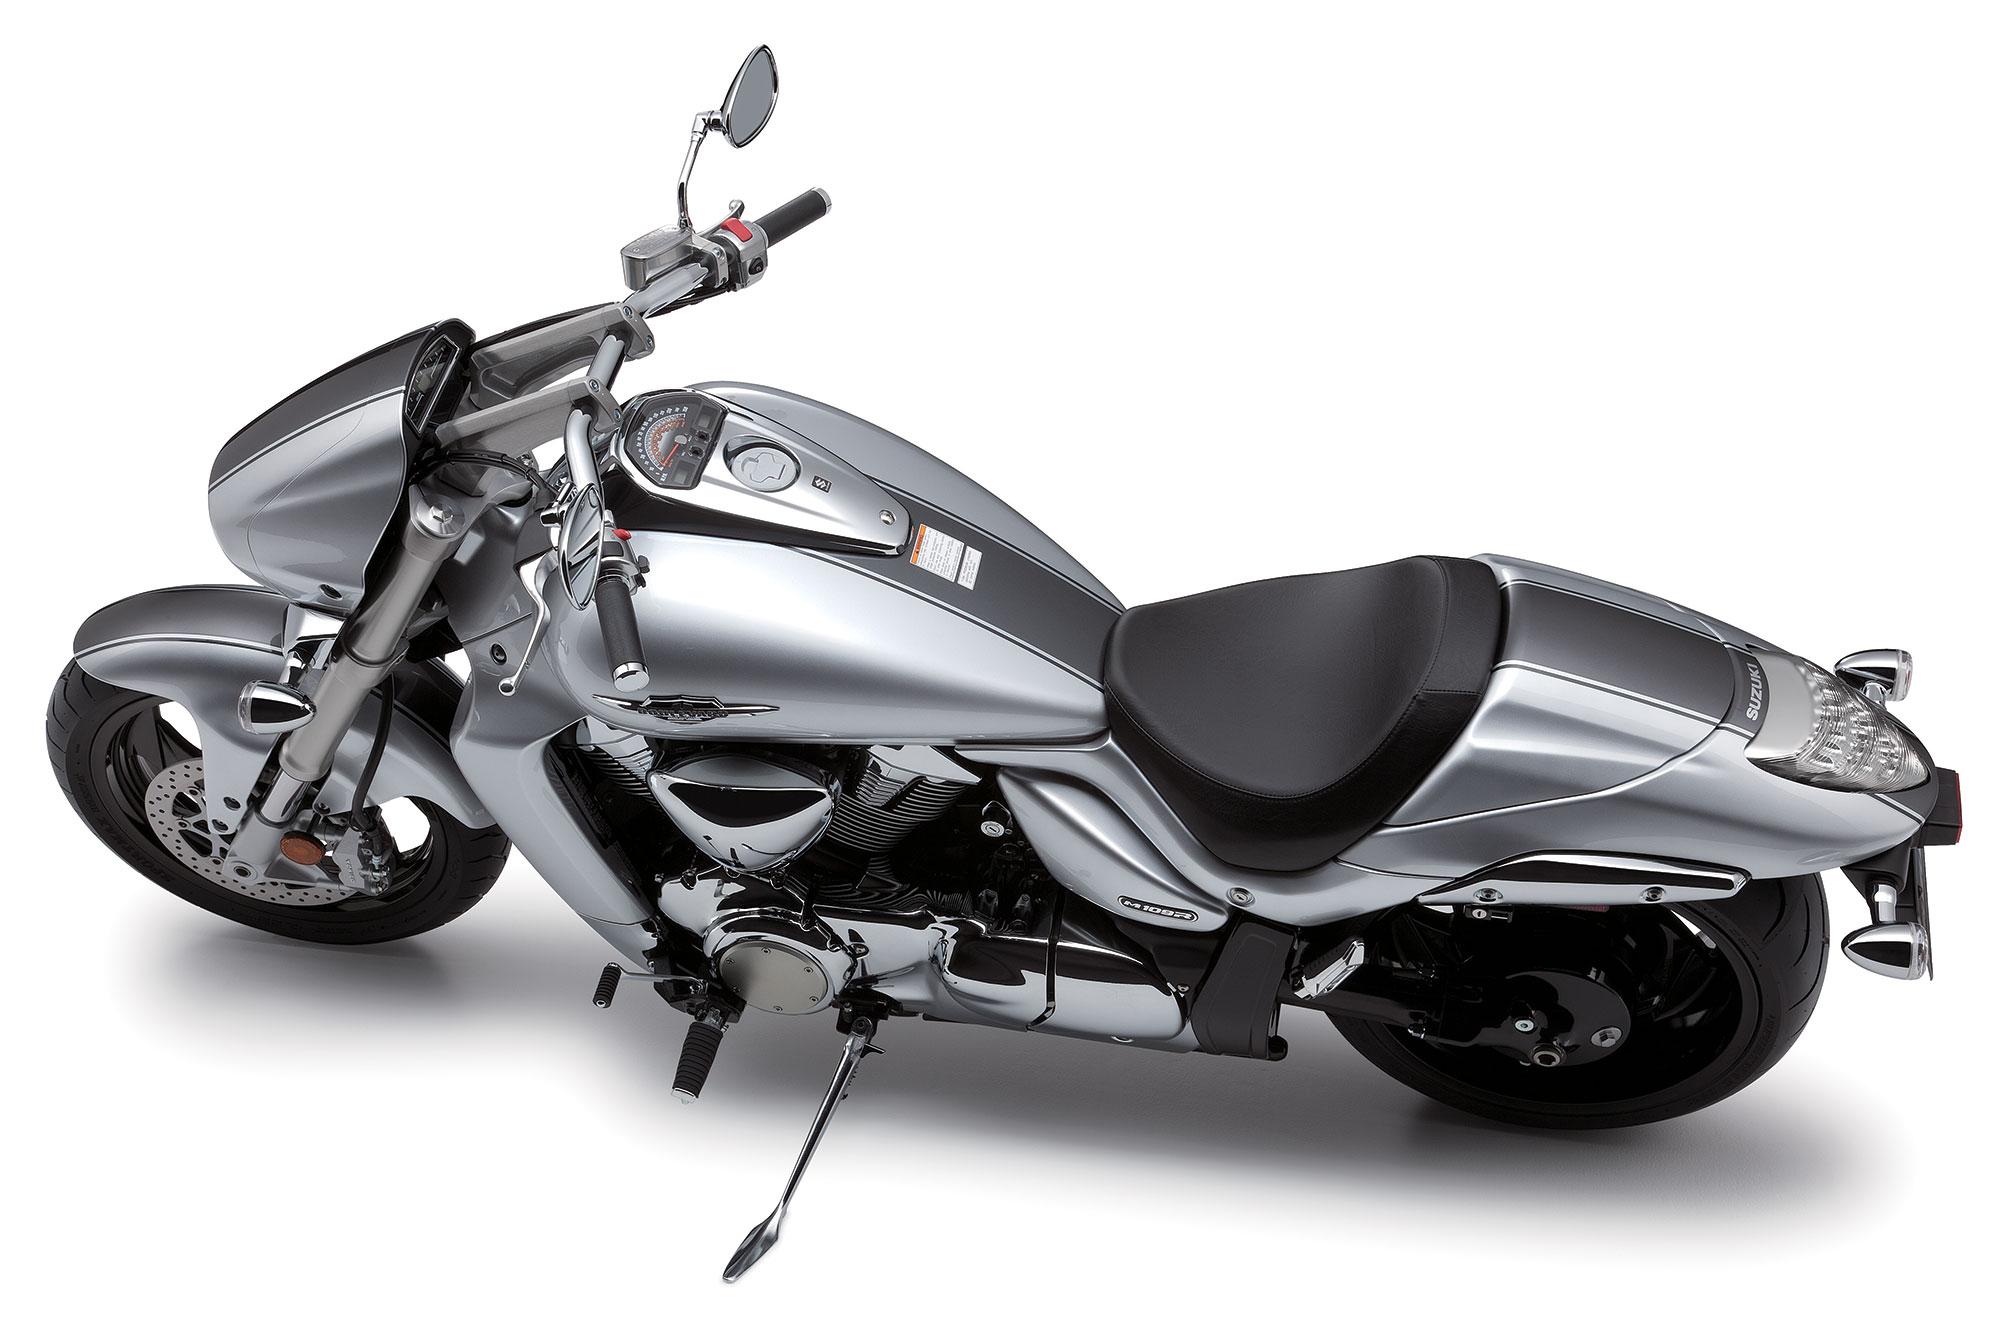 2014 Suzuki Boulevard M109R Limited Edition Review